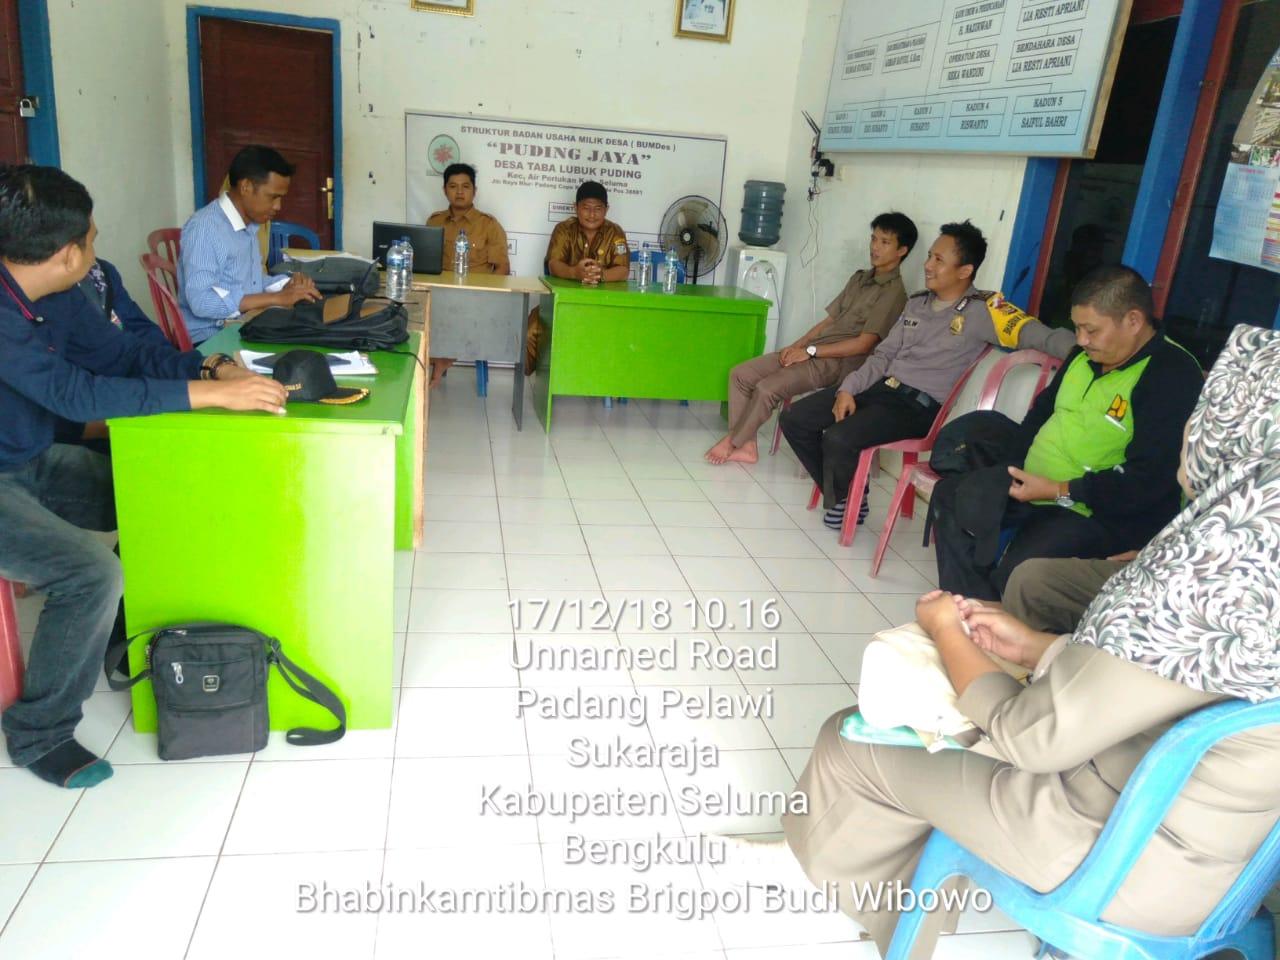 Bhabinkamtibmas Dampingi Tim Inspektorat Pemda Seluma Monitoring Hasil Pembangunan Sumber ADD